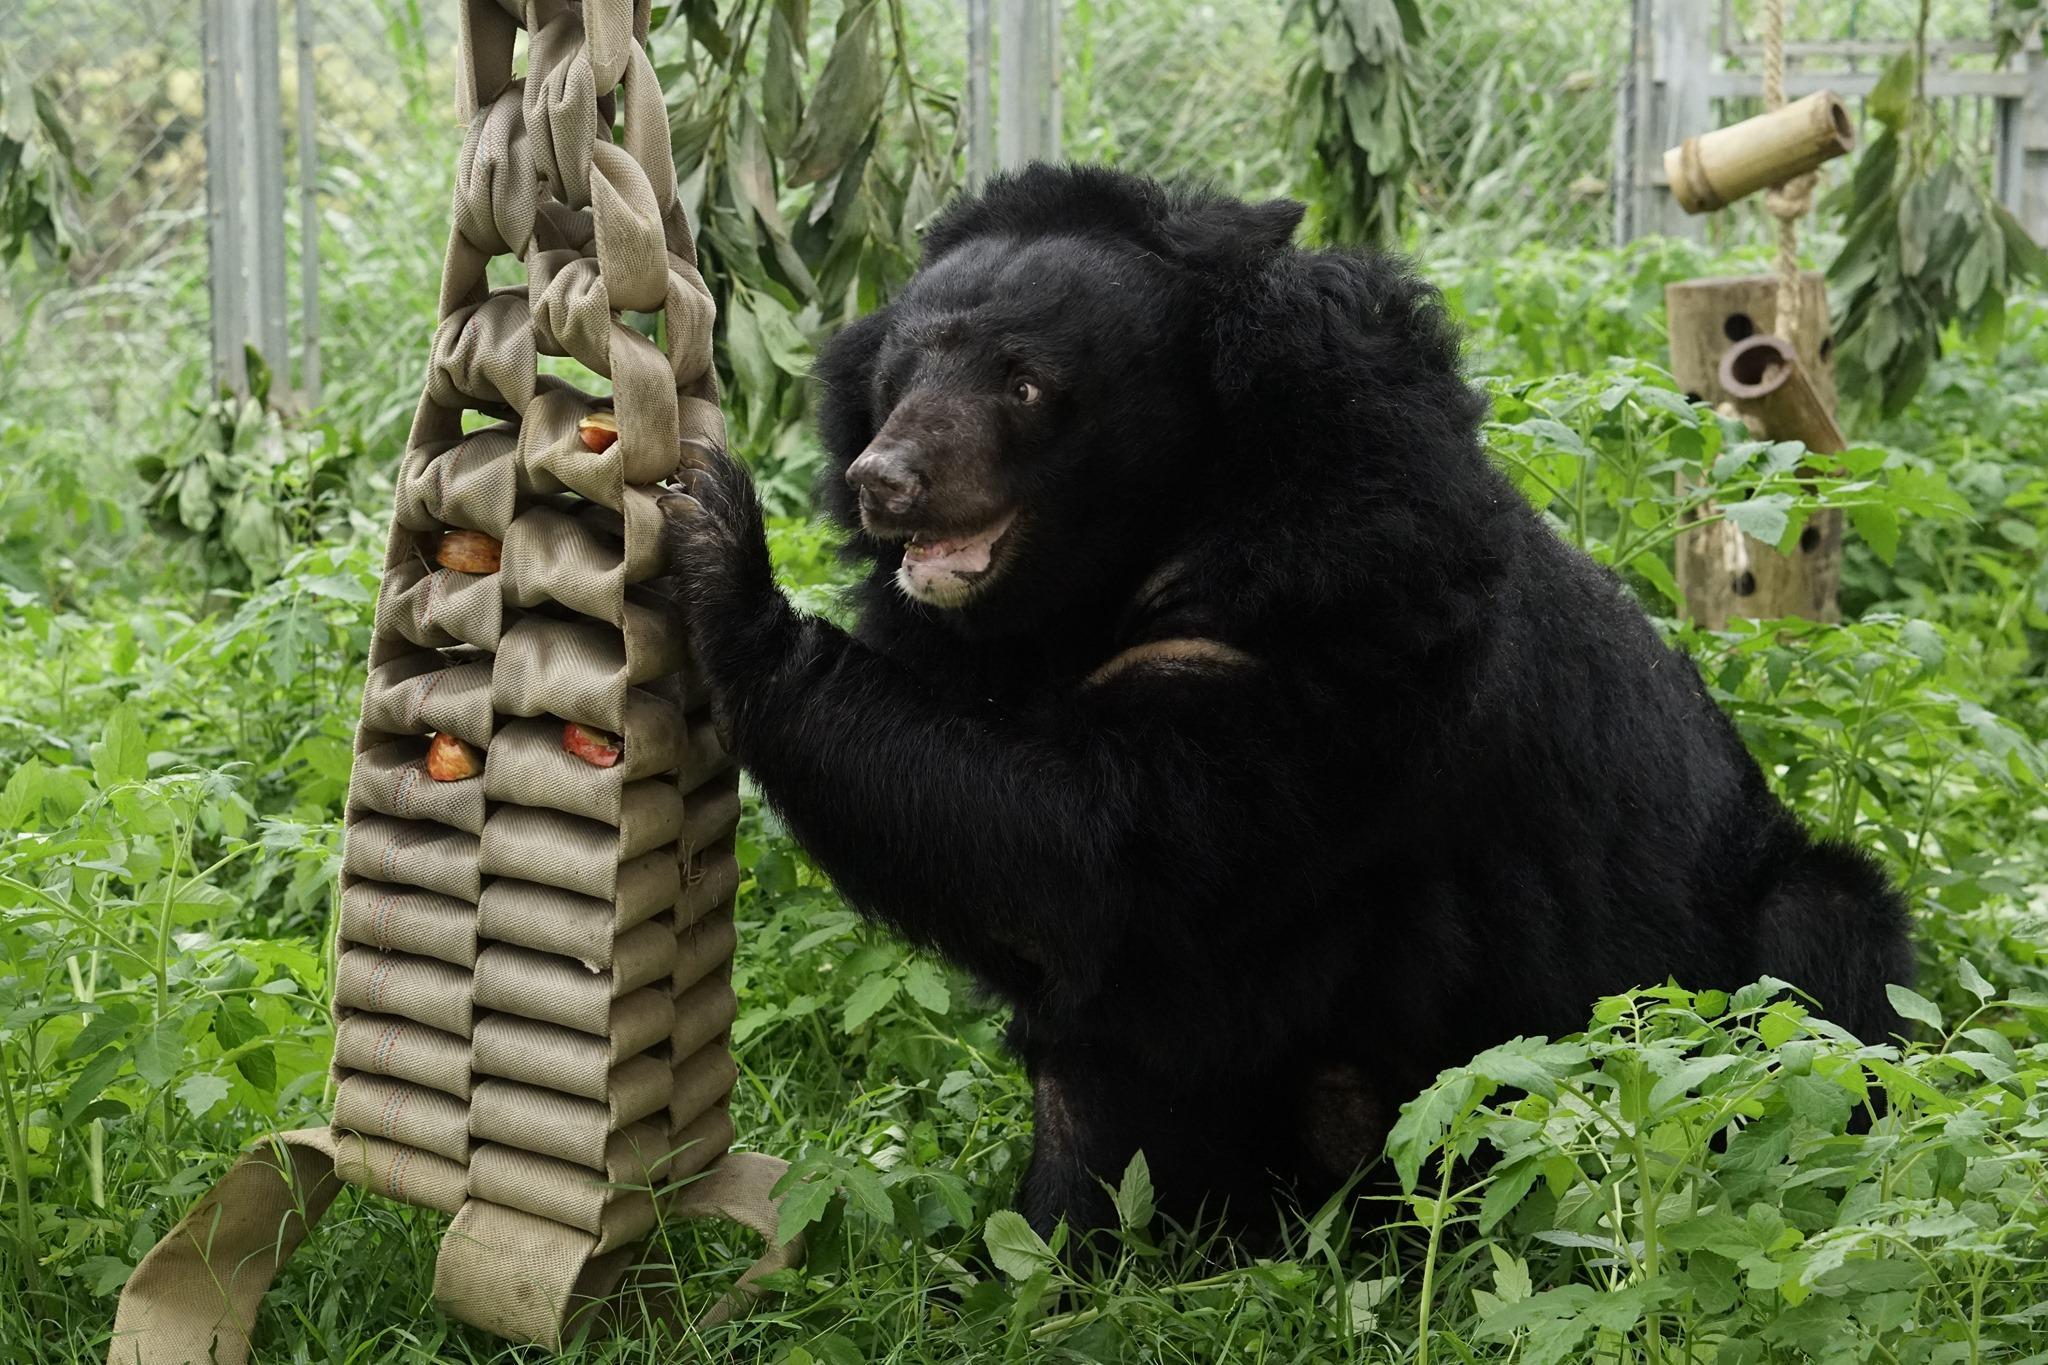 Bear Xoai enjoying the outdoors